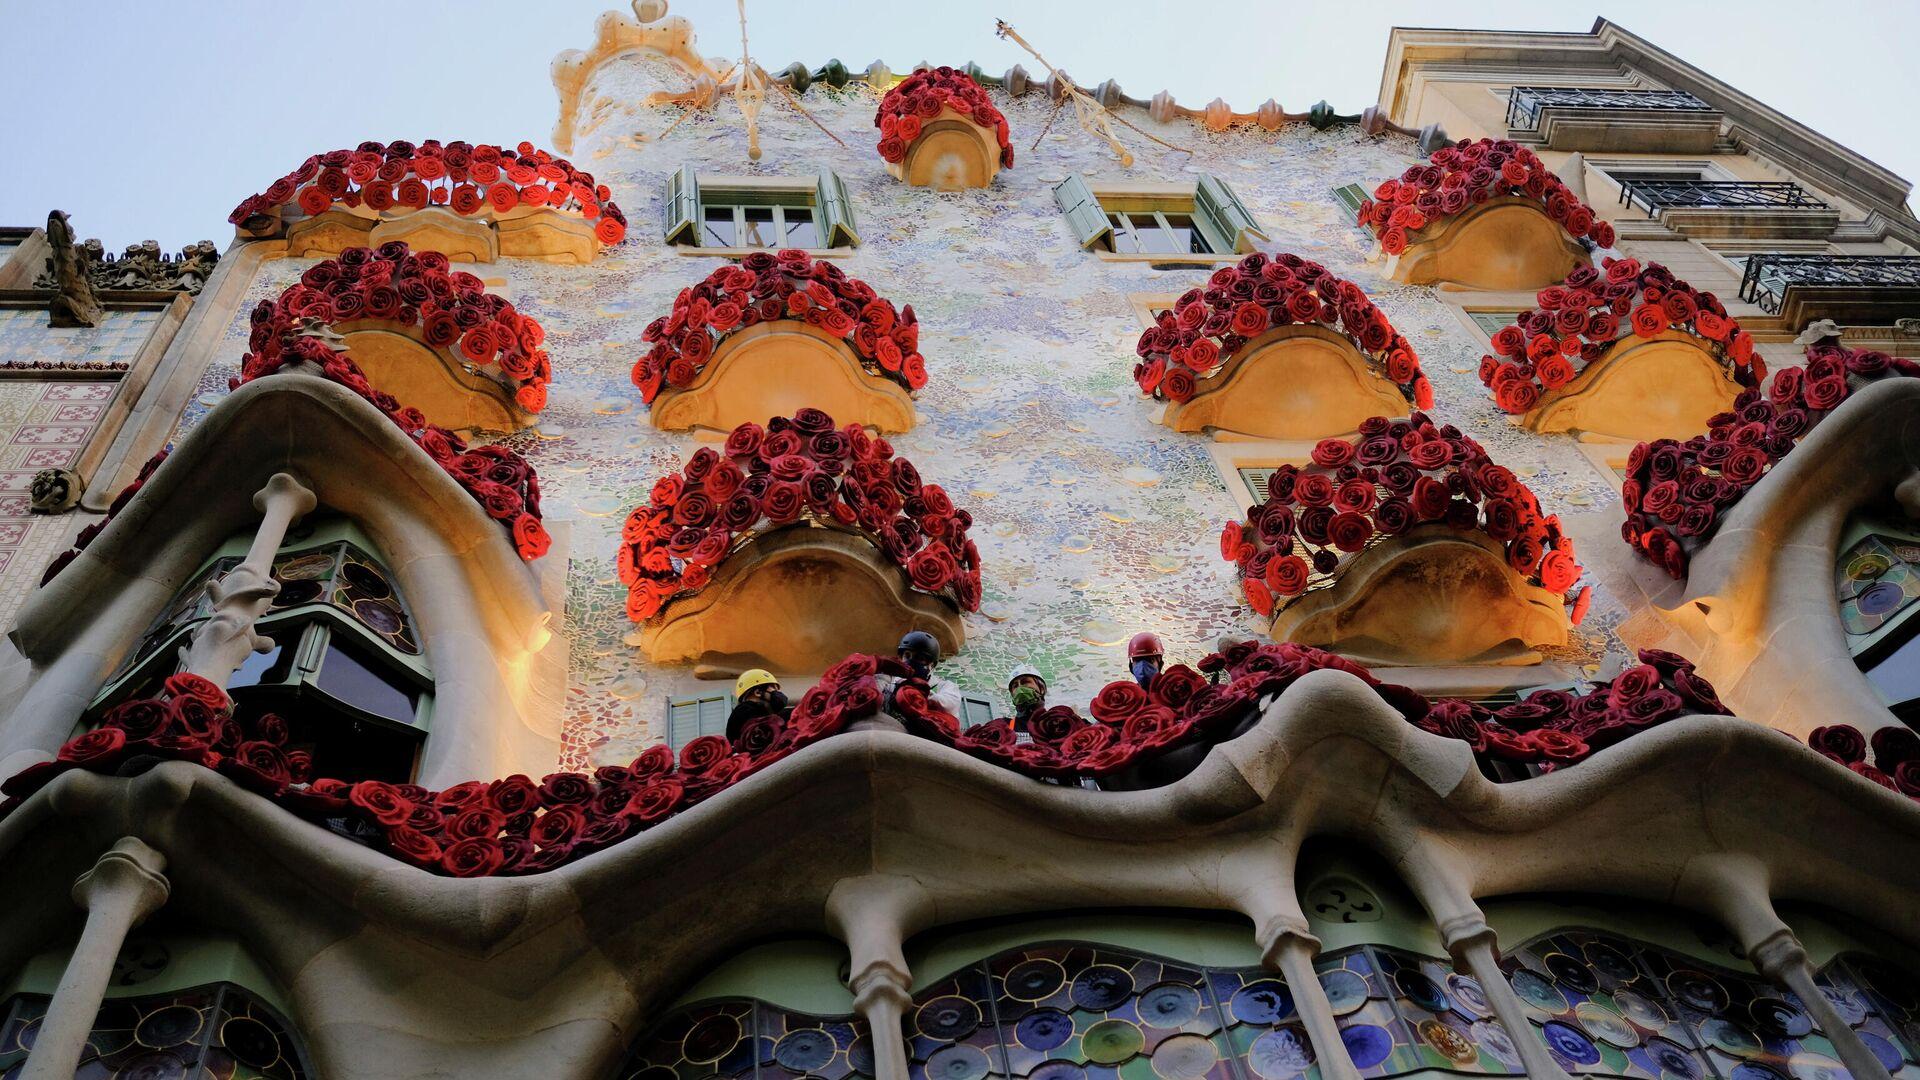 Casa Batlló decorada para la fiesta de Sant Jordi - Sputnik Mundo, 1920, 23.04.2021